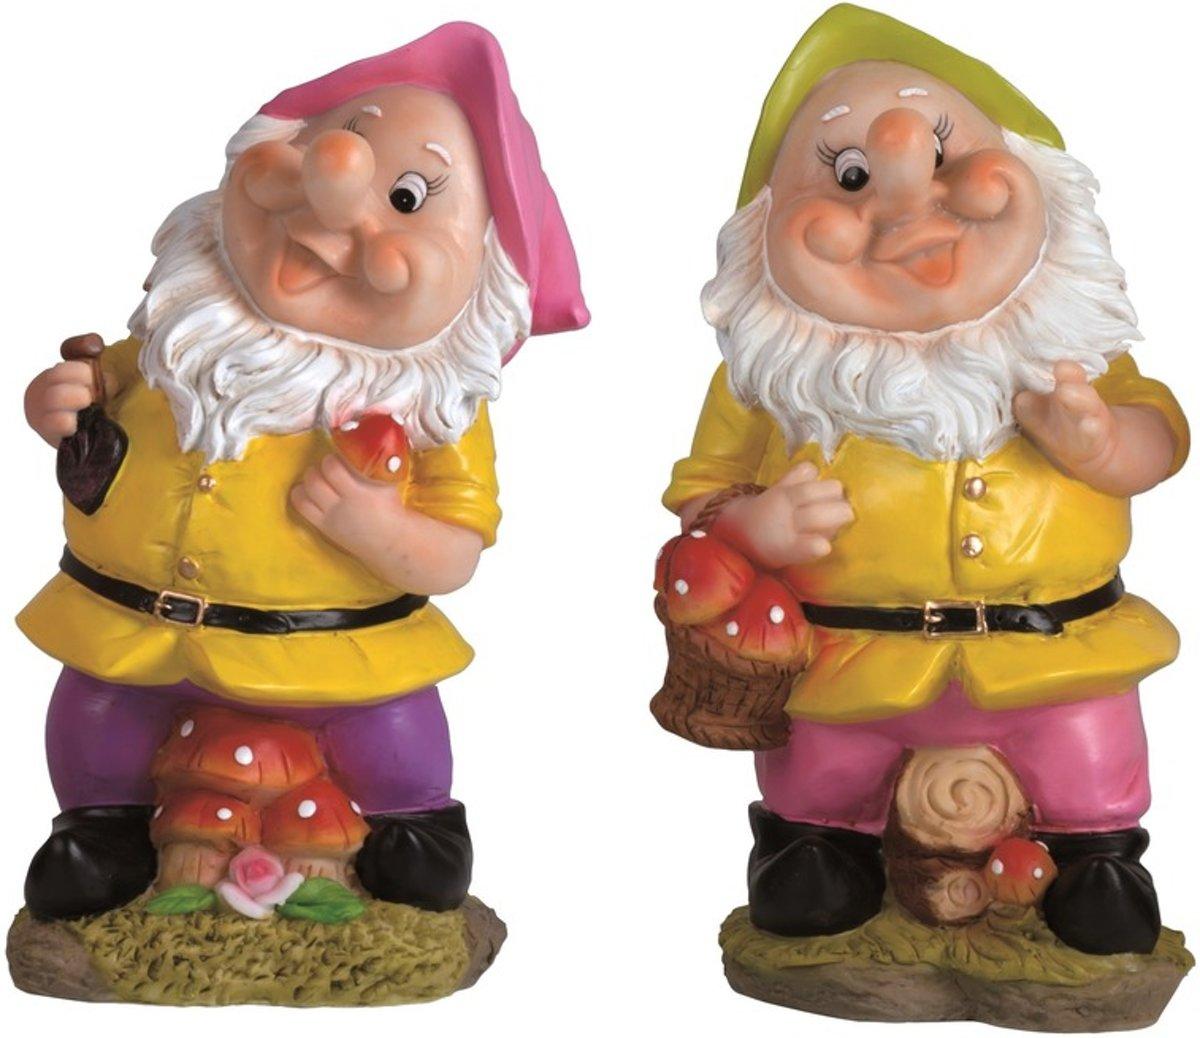 2x Tuinkabouters 30 cm roze/groene muts